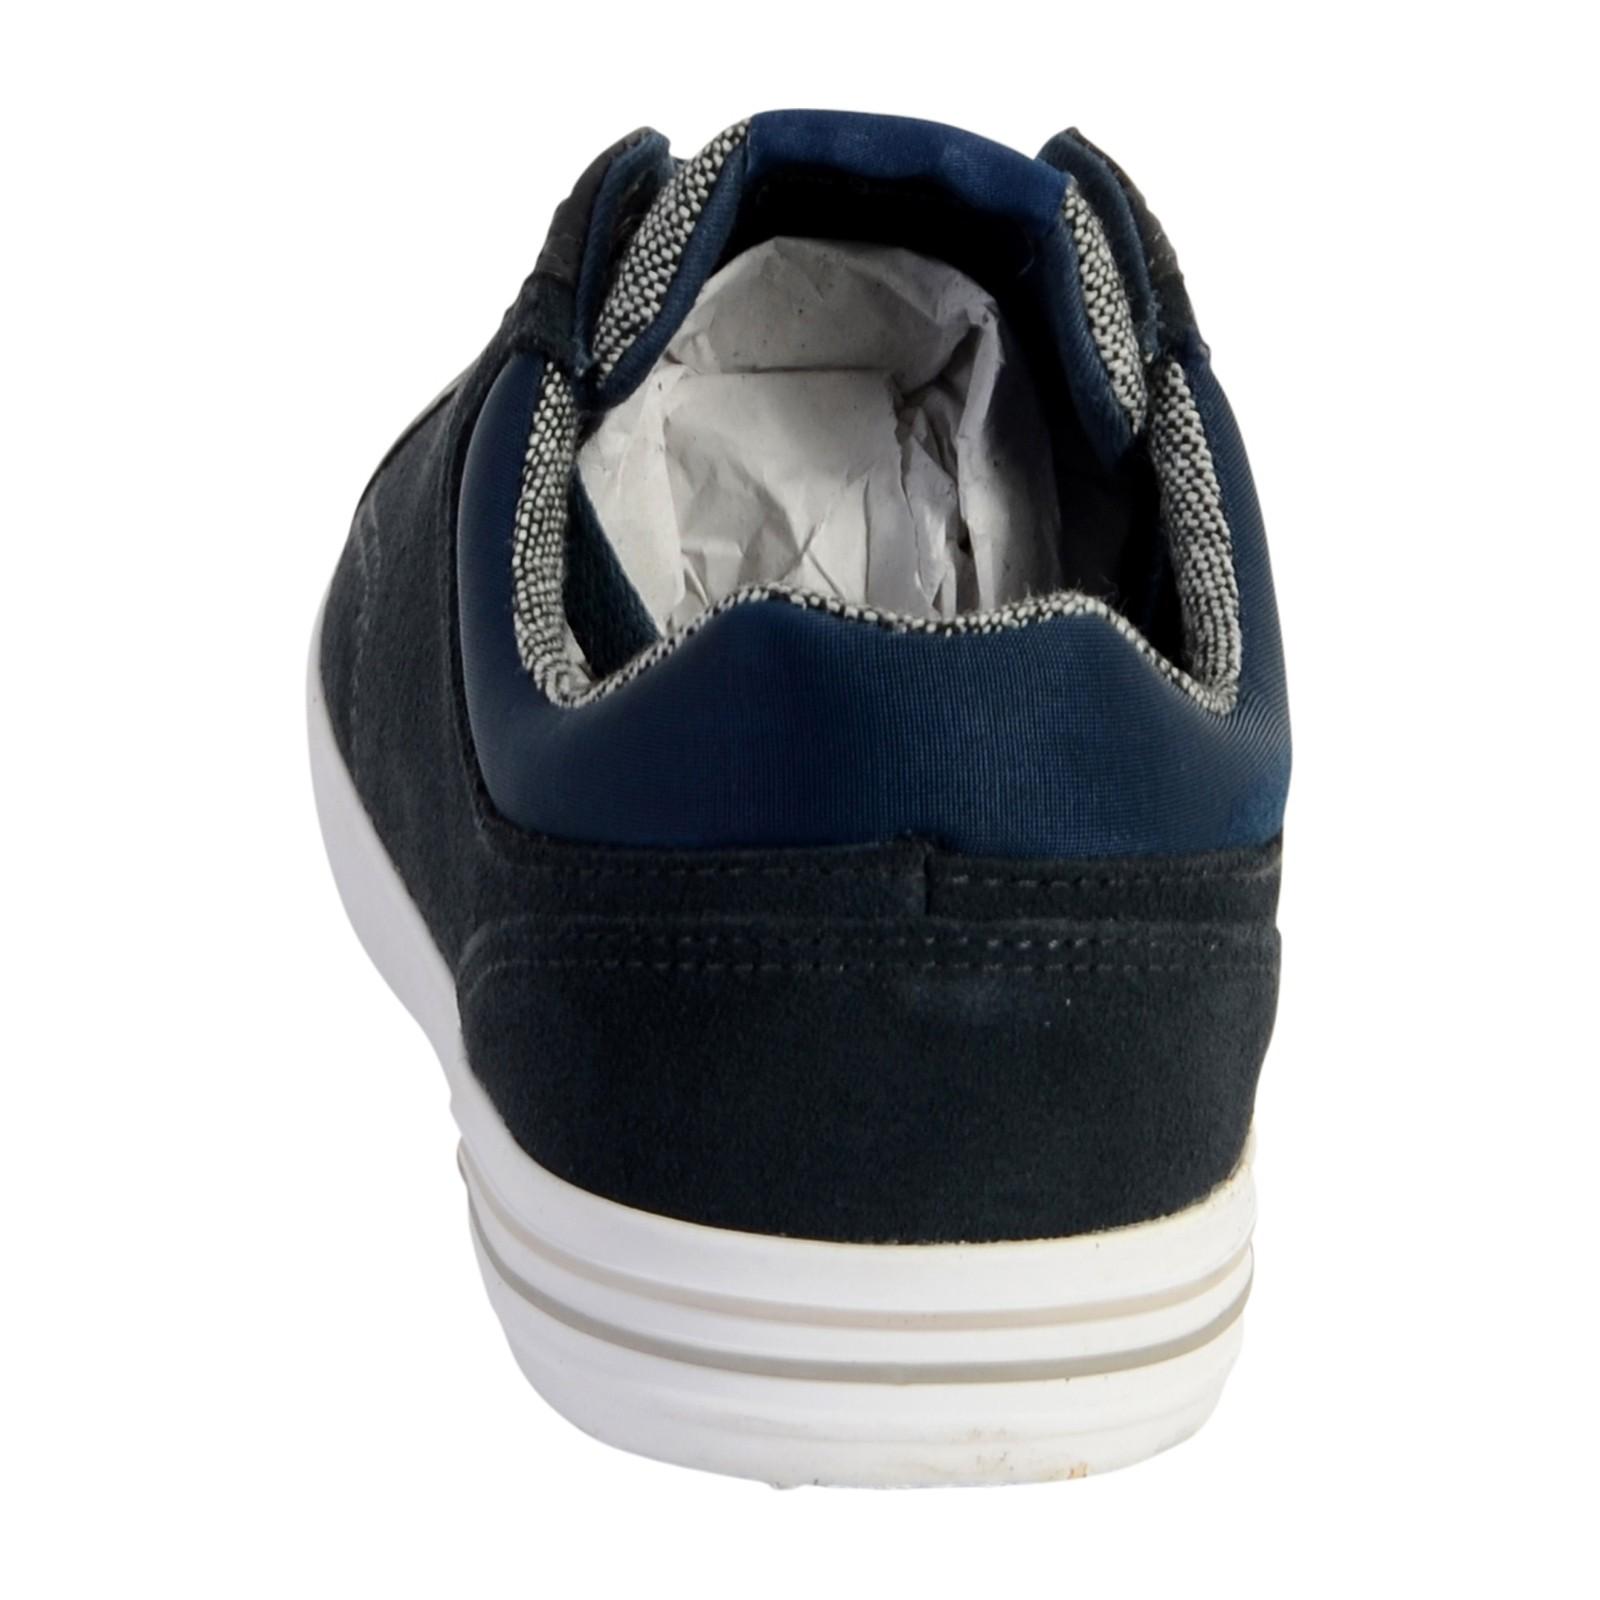 Mix Jeans Basket Jeans North Pepe Basket North Mix Basket Pepe Pepe Jeans 6qxtd0E1w6